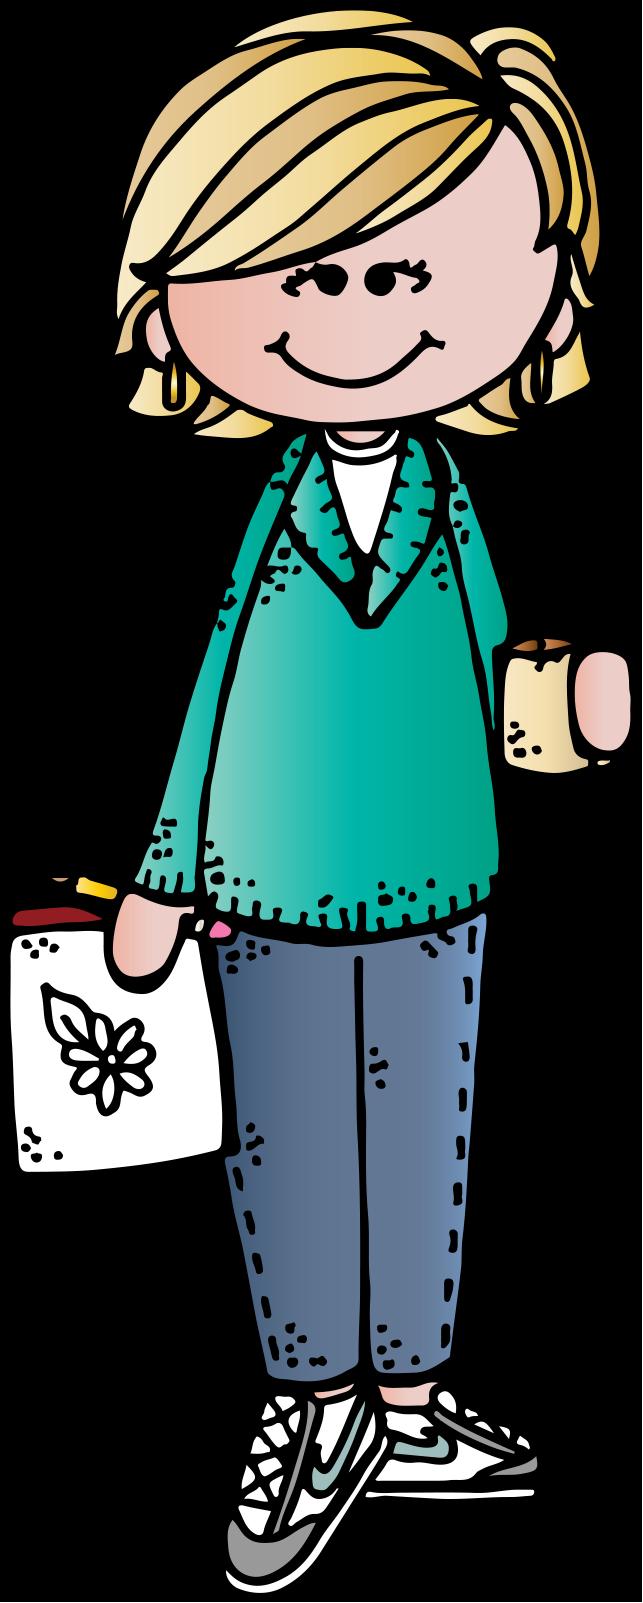 Maestra dibujo melonheadz pinterest. Clipart school responsibility